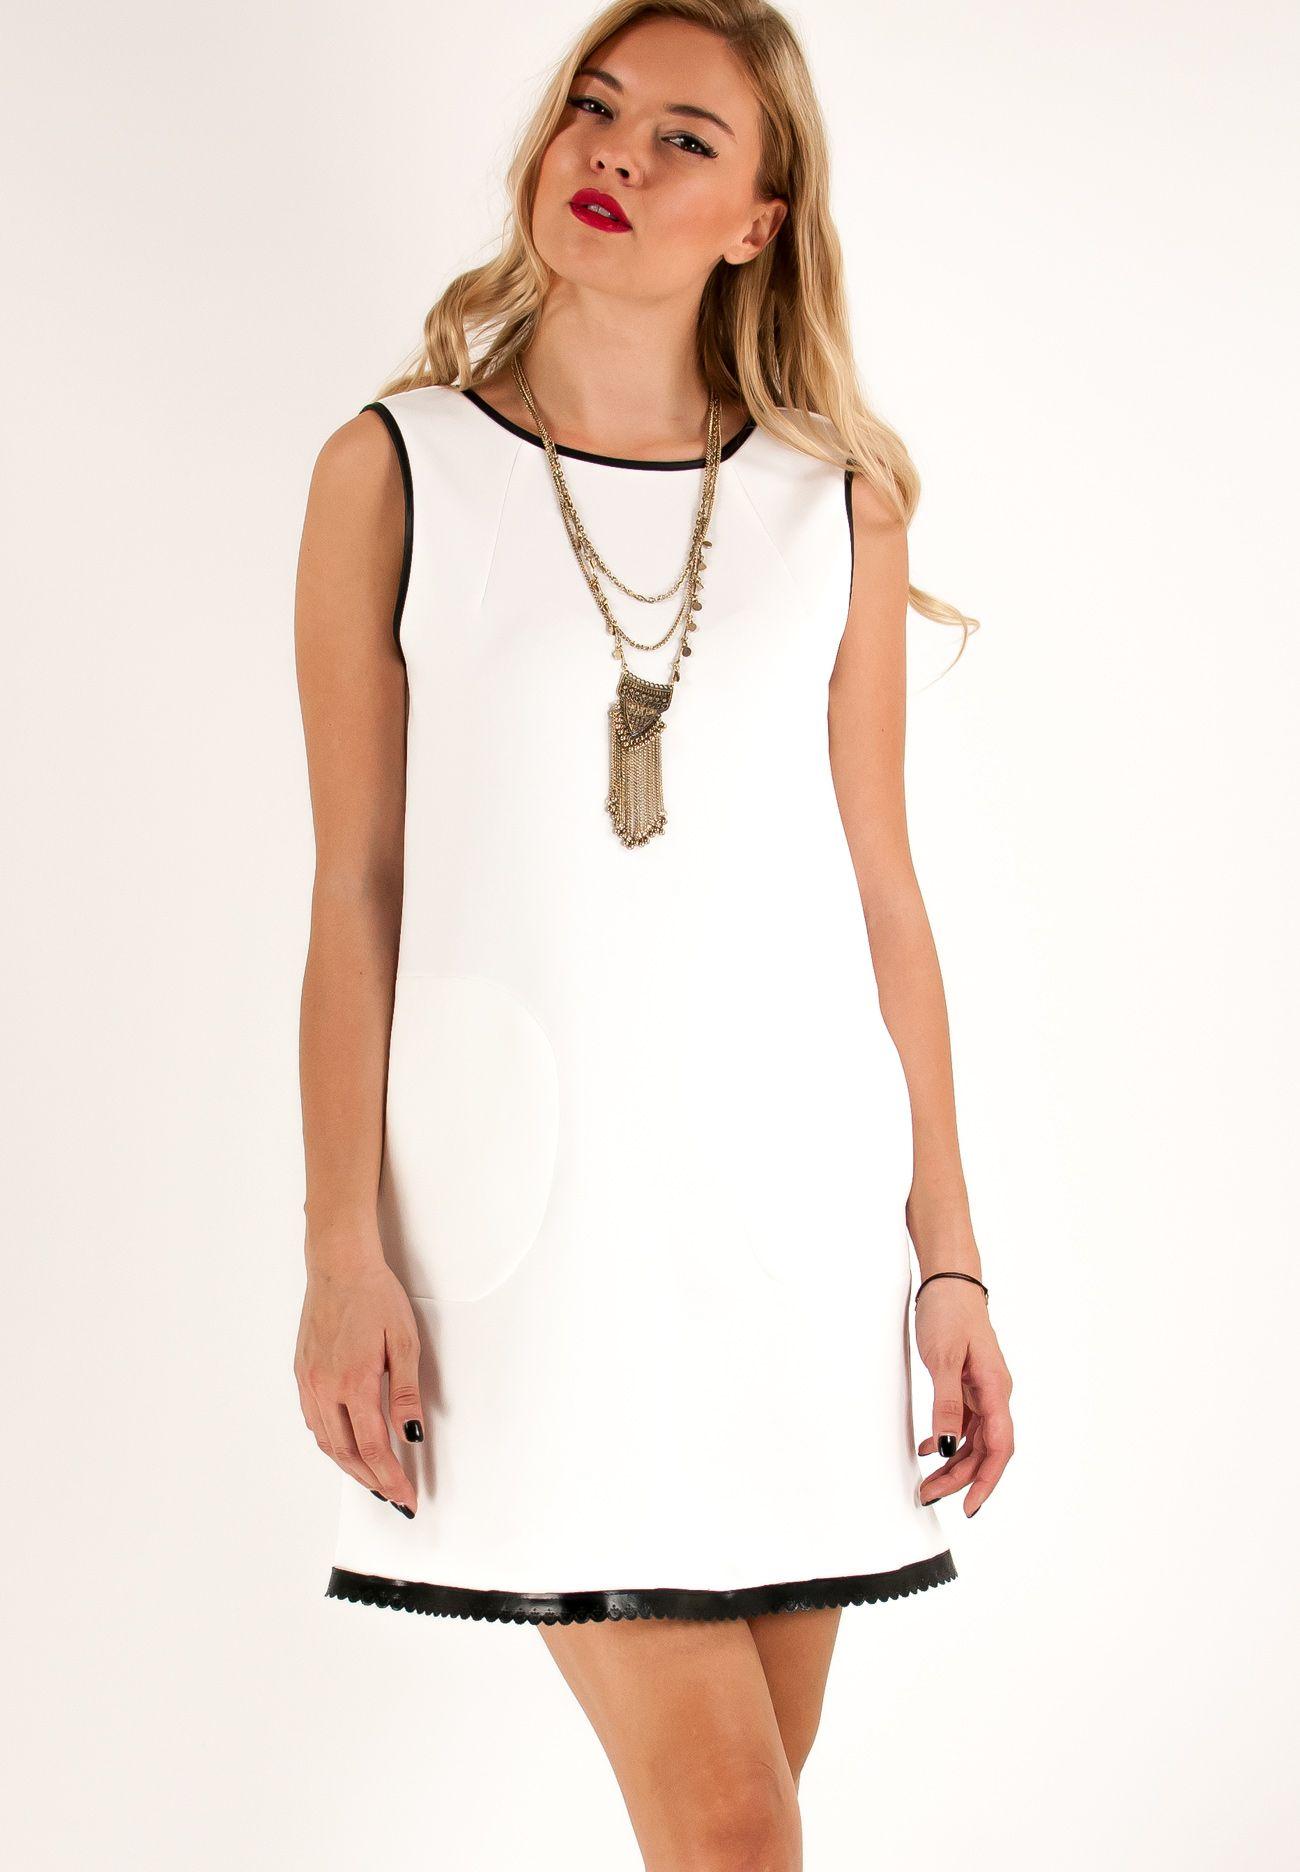 3977eda5246 Μίνι αμάνικο φόρεμα σε ίσια γραμμή με τσέπες στα πλάγια και δερμάτινη  λεπτομέρεια στο στρίφωμα.